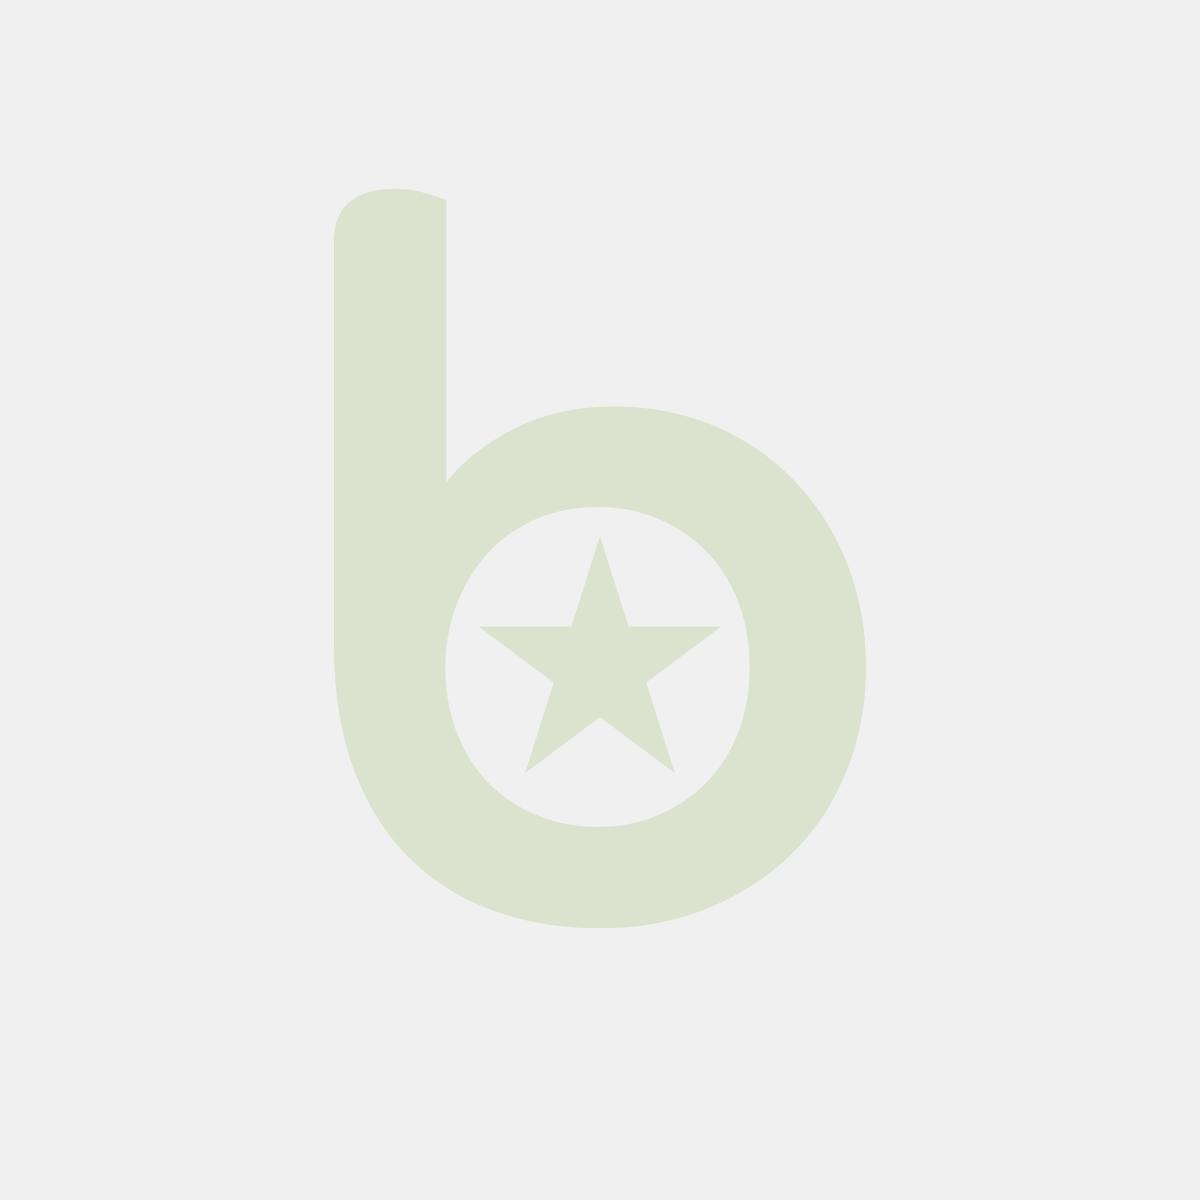 Ramka do tacek MANUPACK 227x178/3 trójdzielna TnP